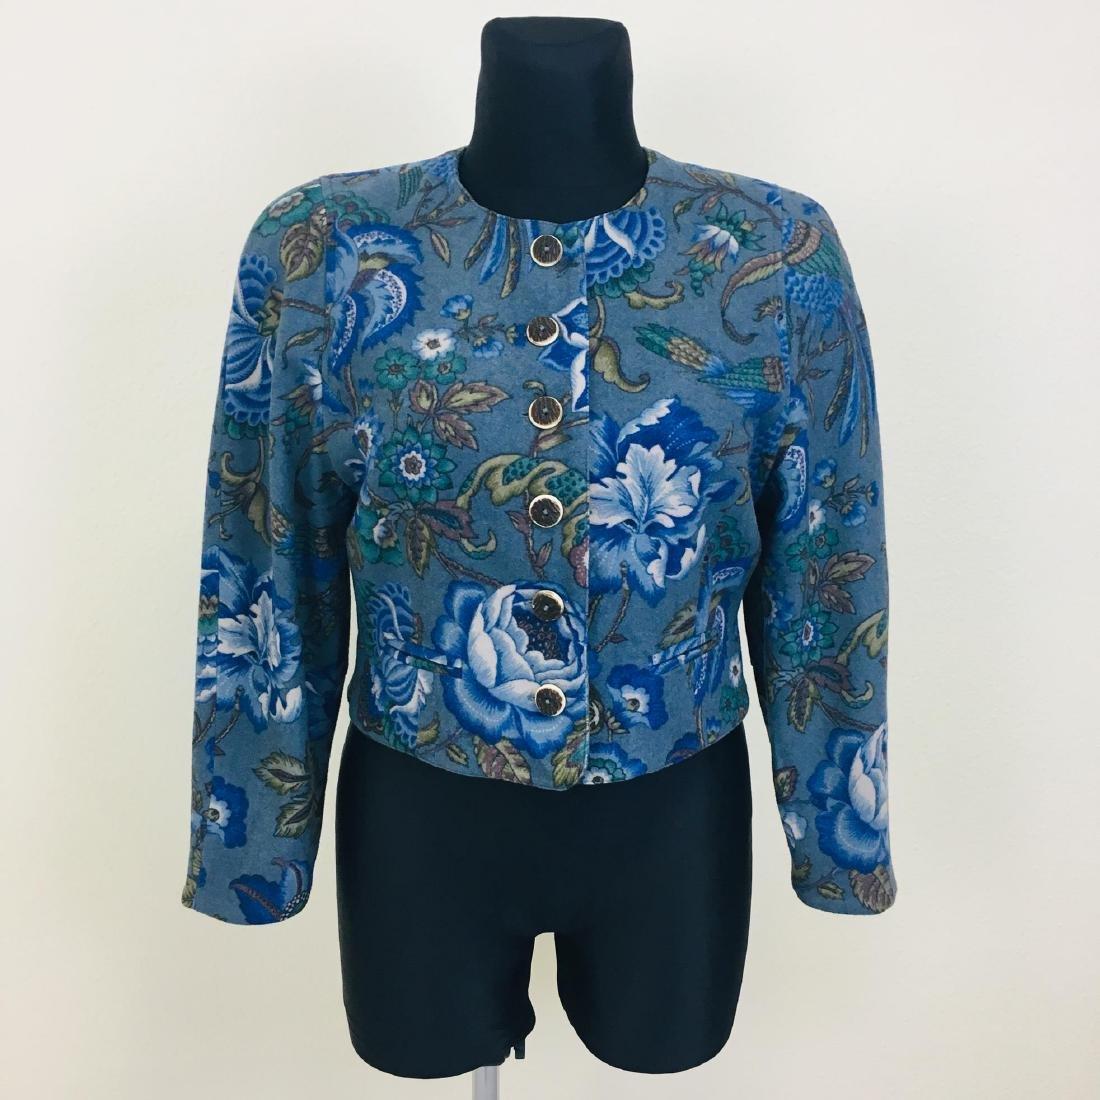 Vintage Women's Wool Blend Blazer Jacket